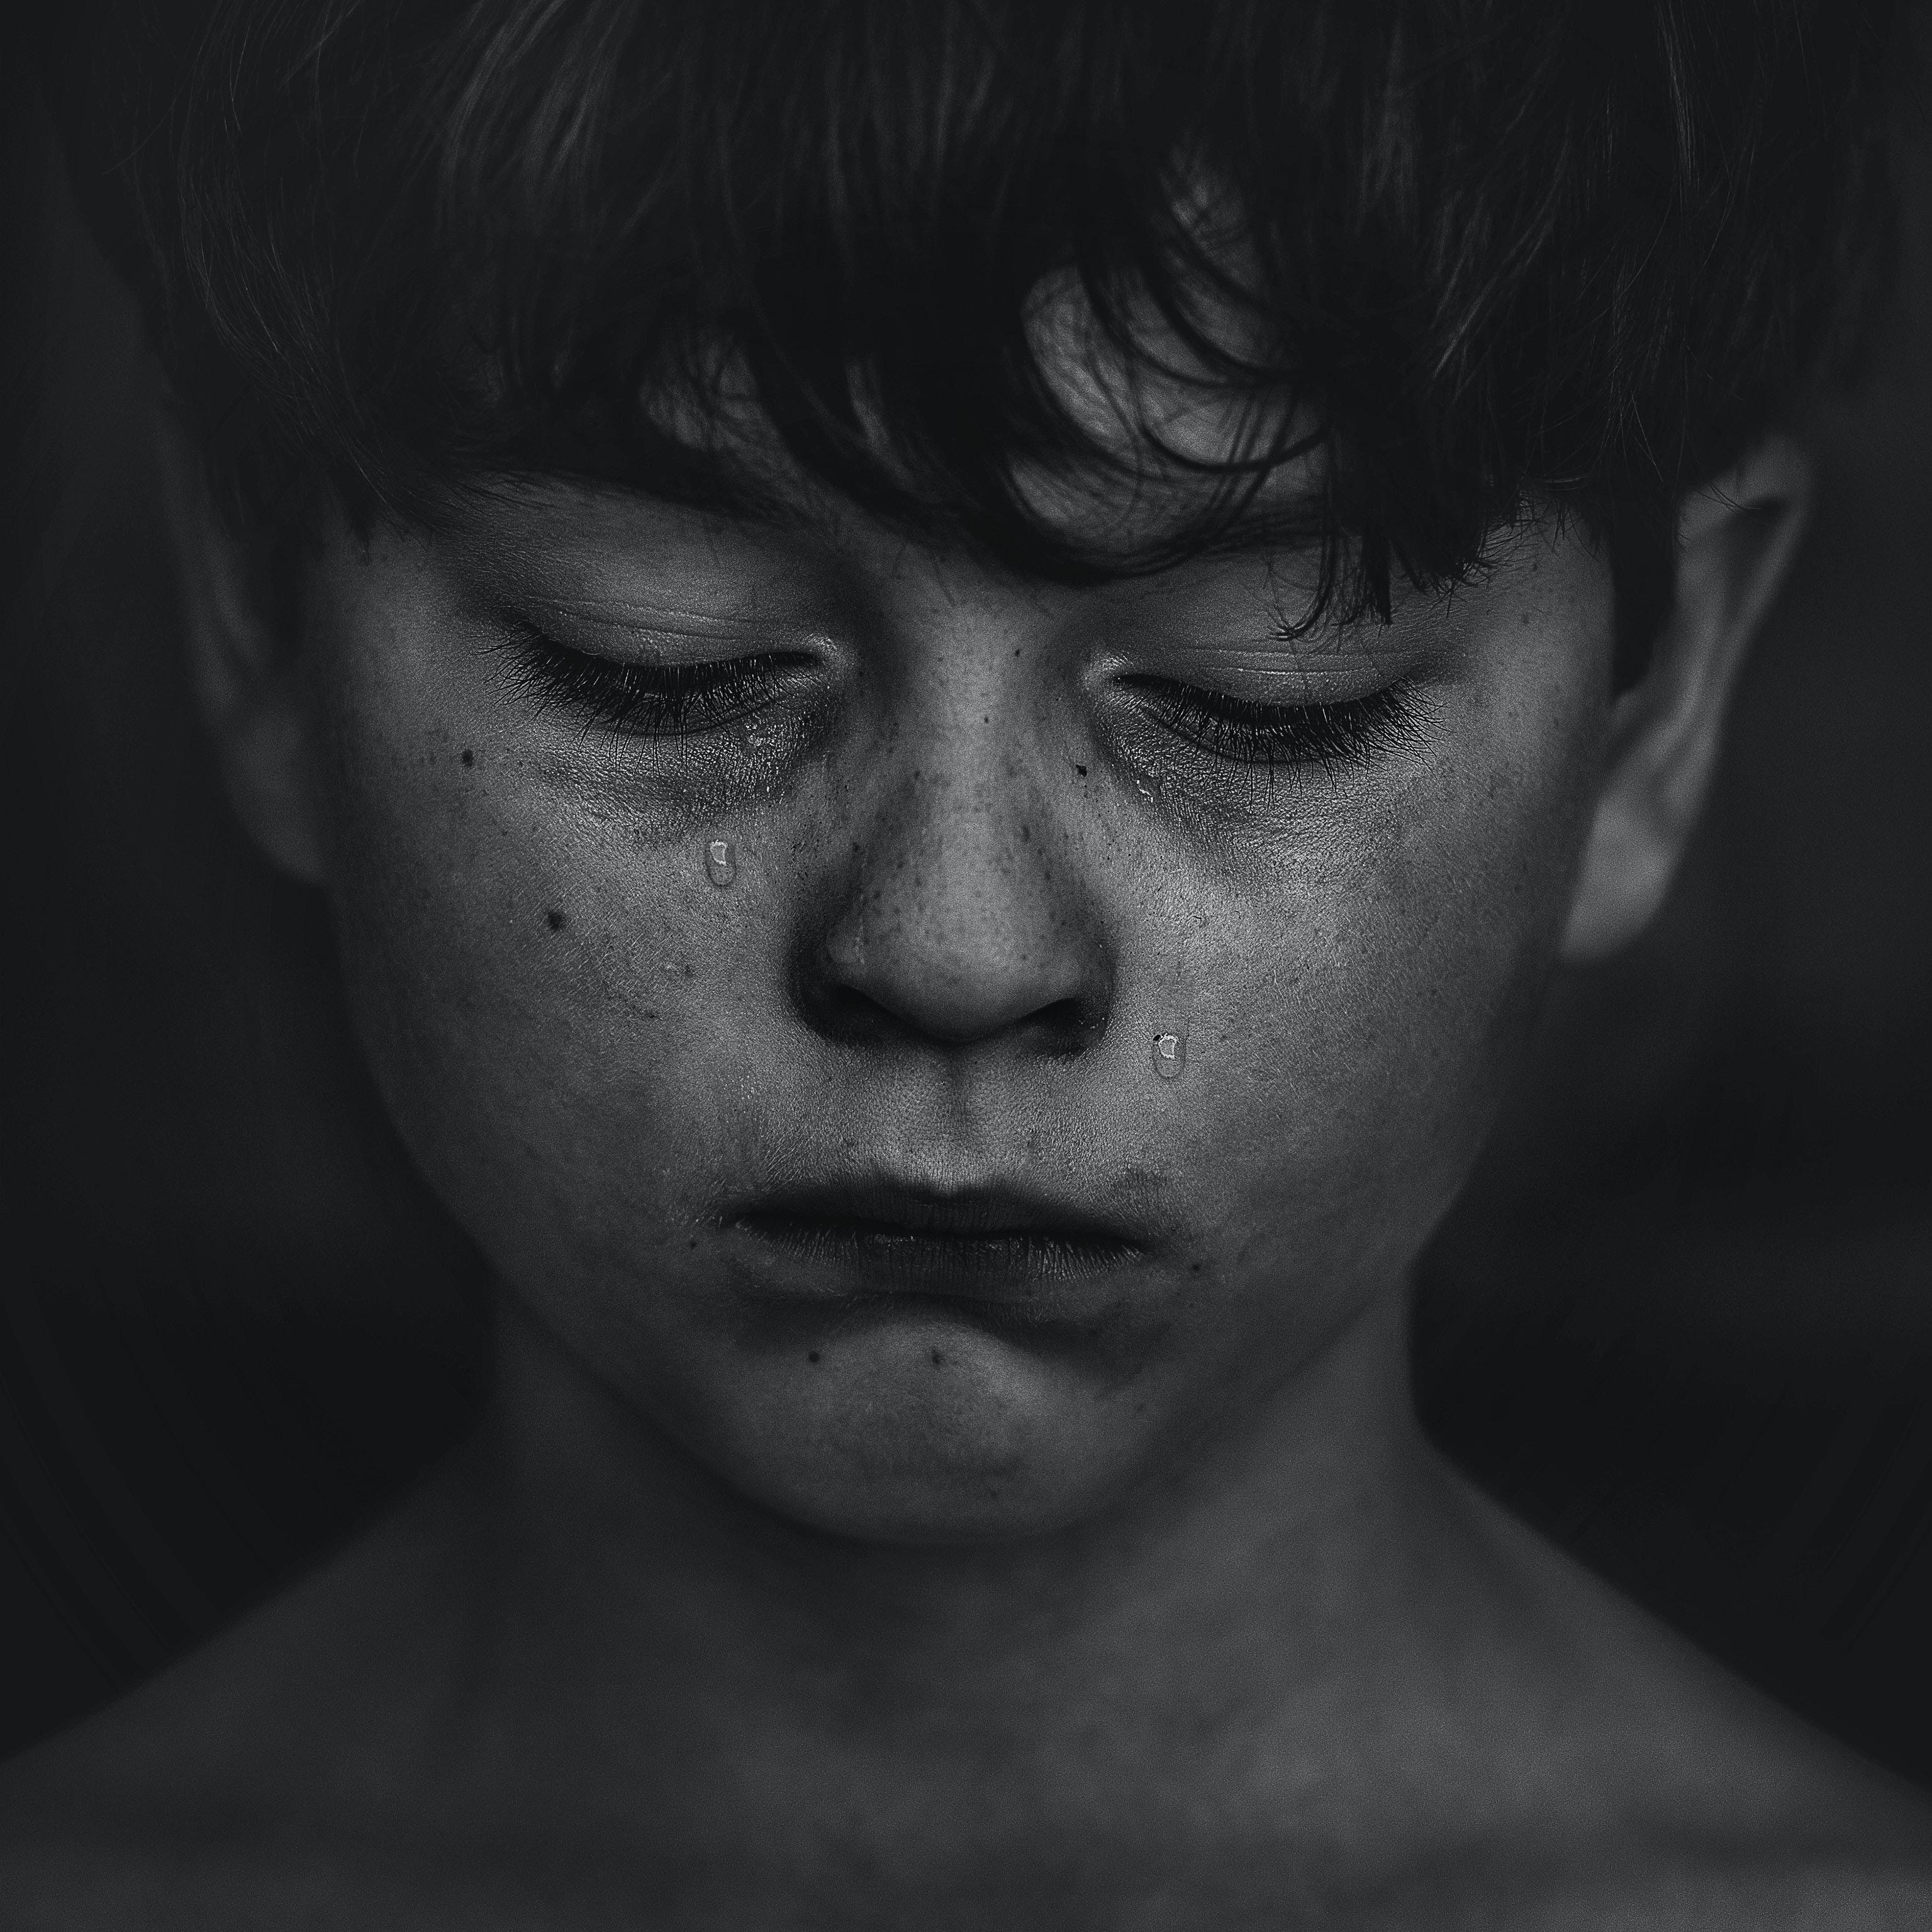 Sad: Sad Pictures [87 Results] · Pexels · Free Stock Photos